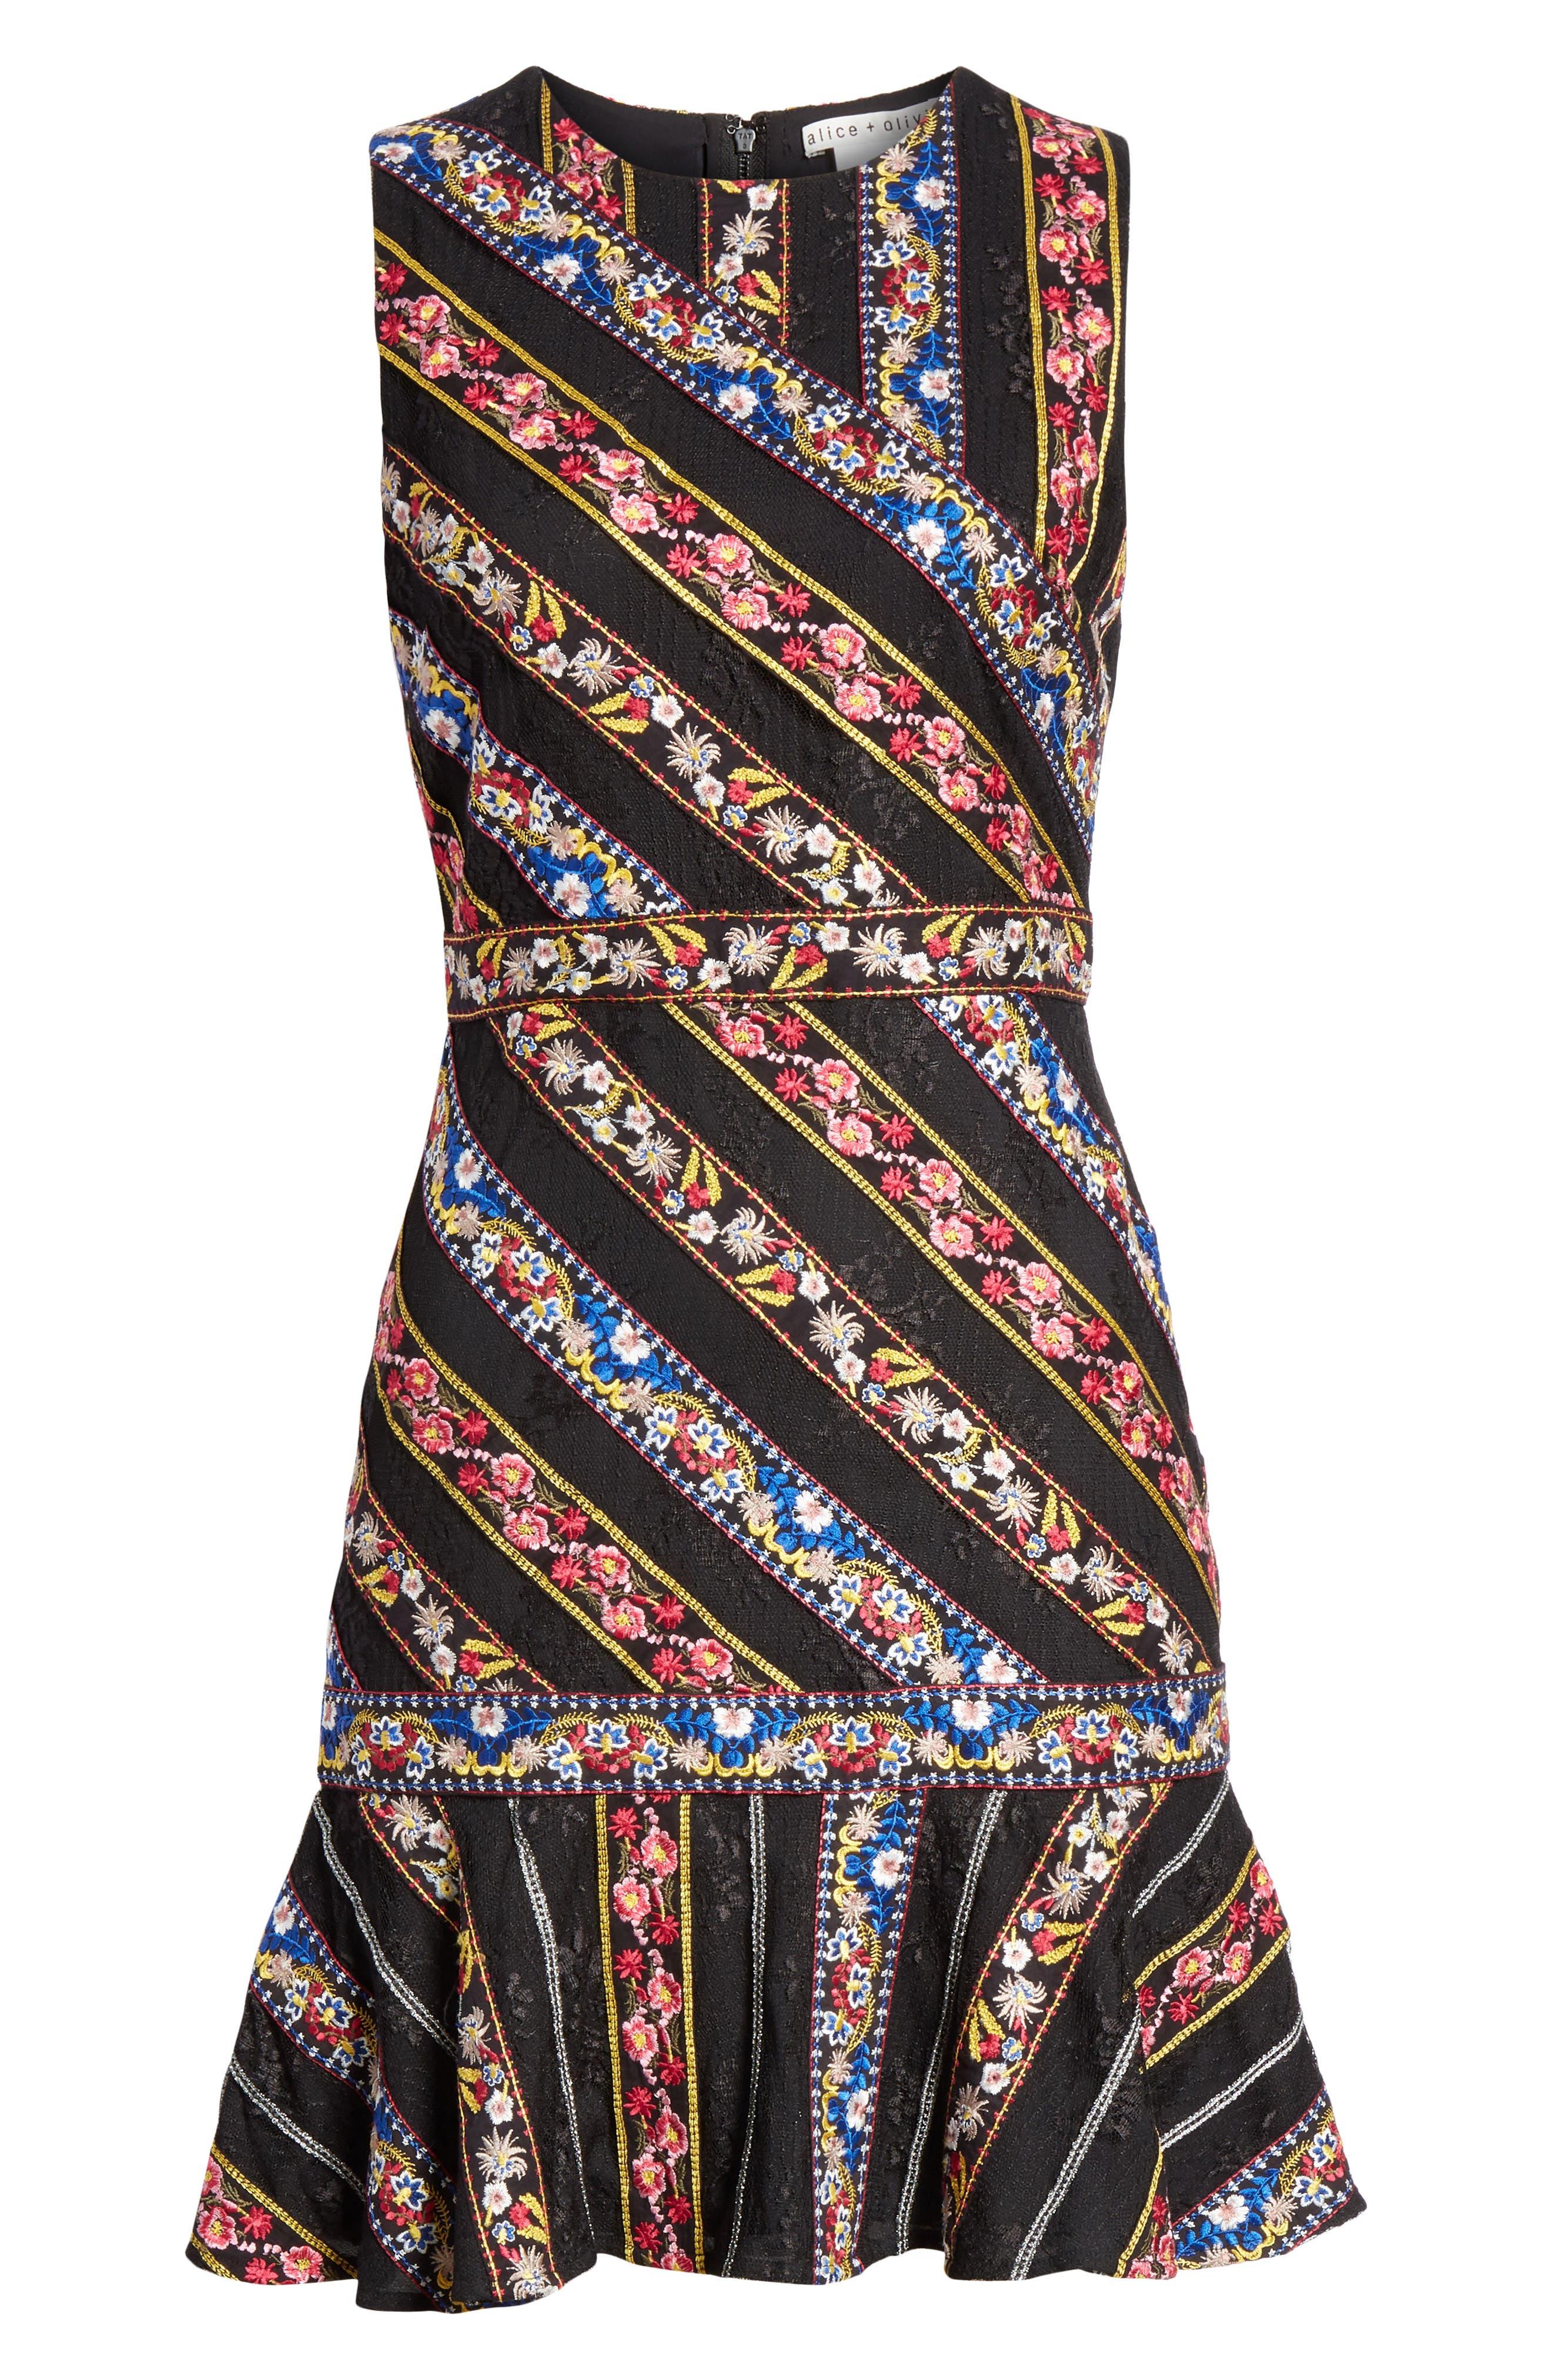 Imani Embroidered Fit & Flare Dress,                             Alternate thumbnail 6, color,                             BLACK/ MULTI